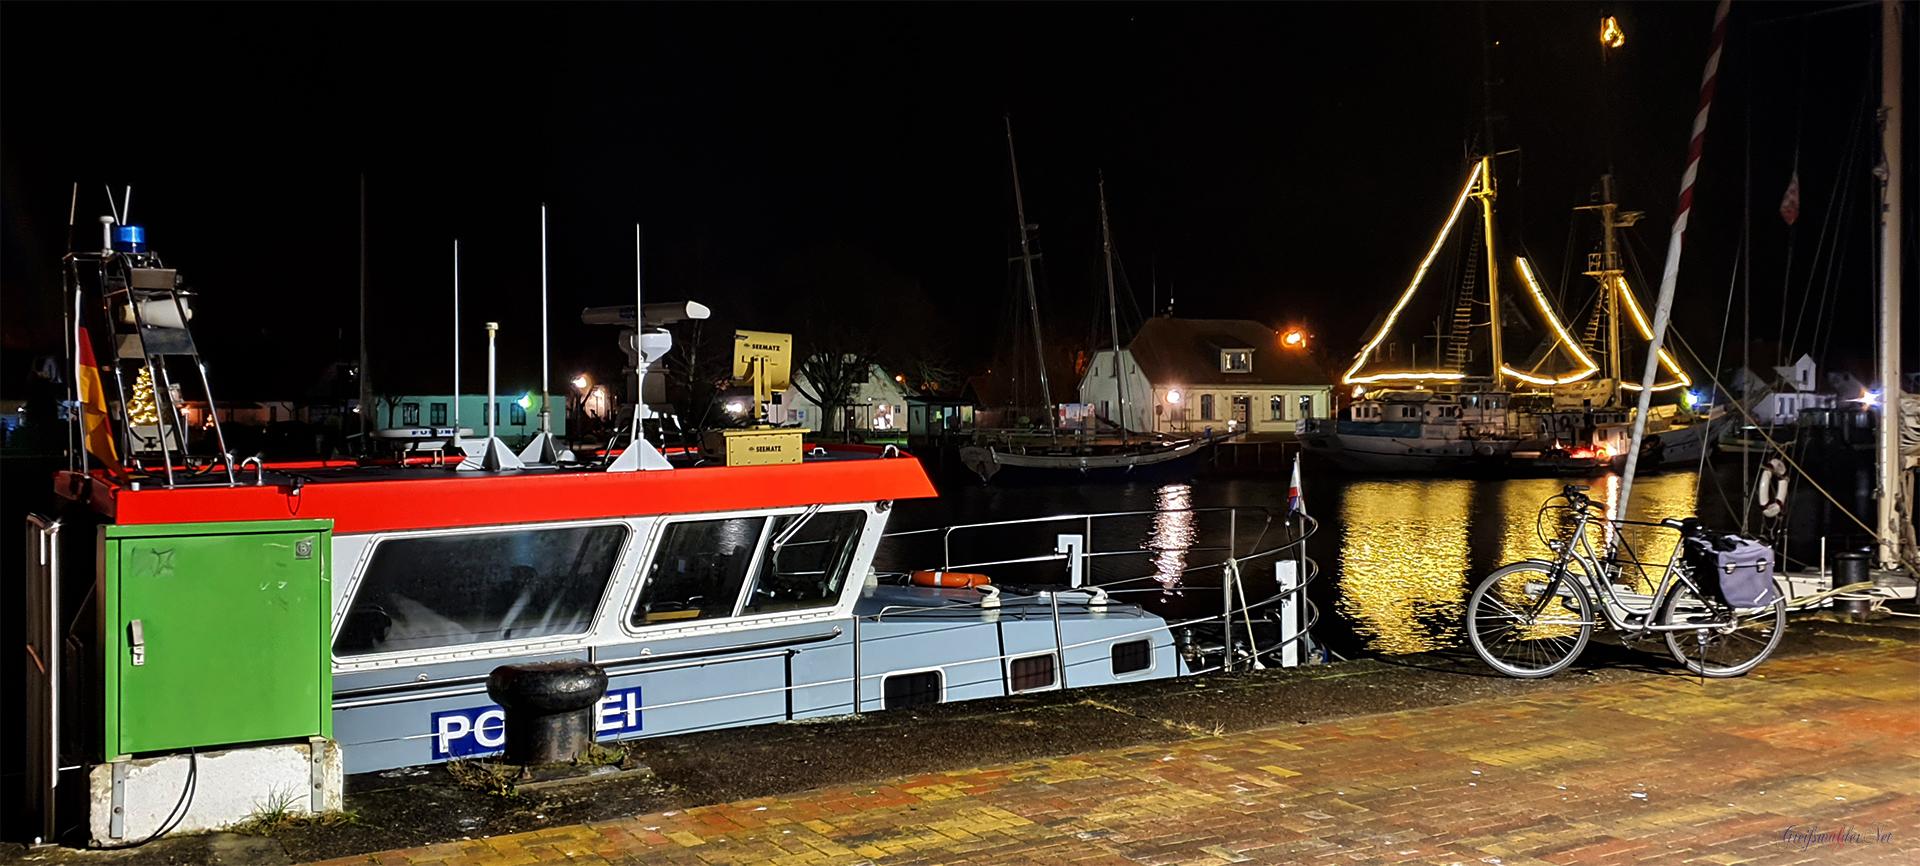 Freitagabend in Greifswald-Wieck